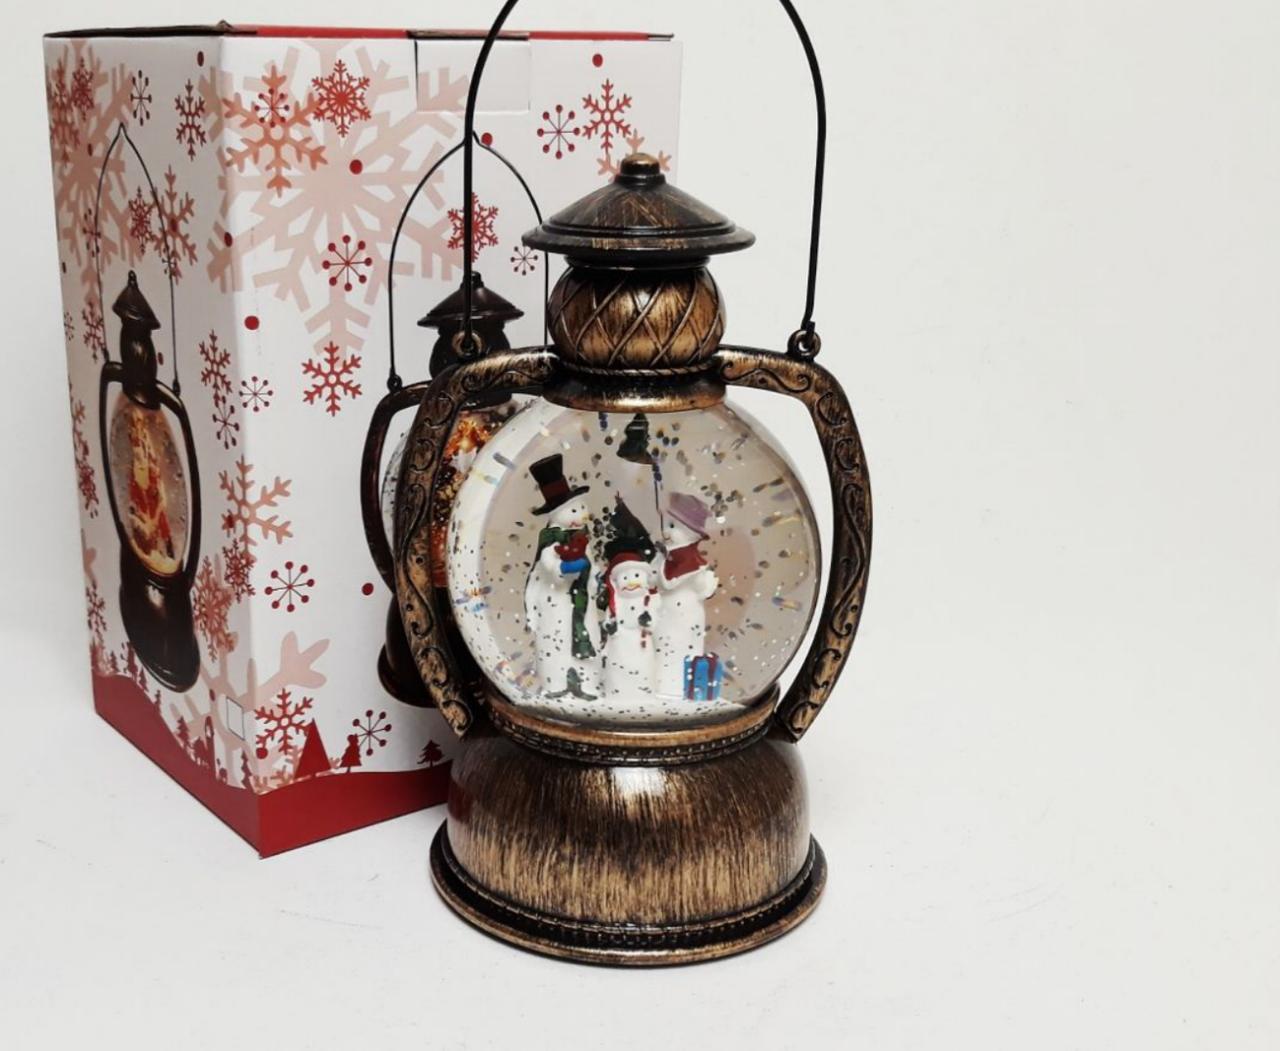 Декоративный новогодний фонарь со снегом внутри